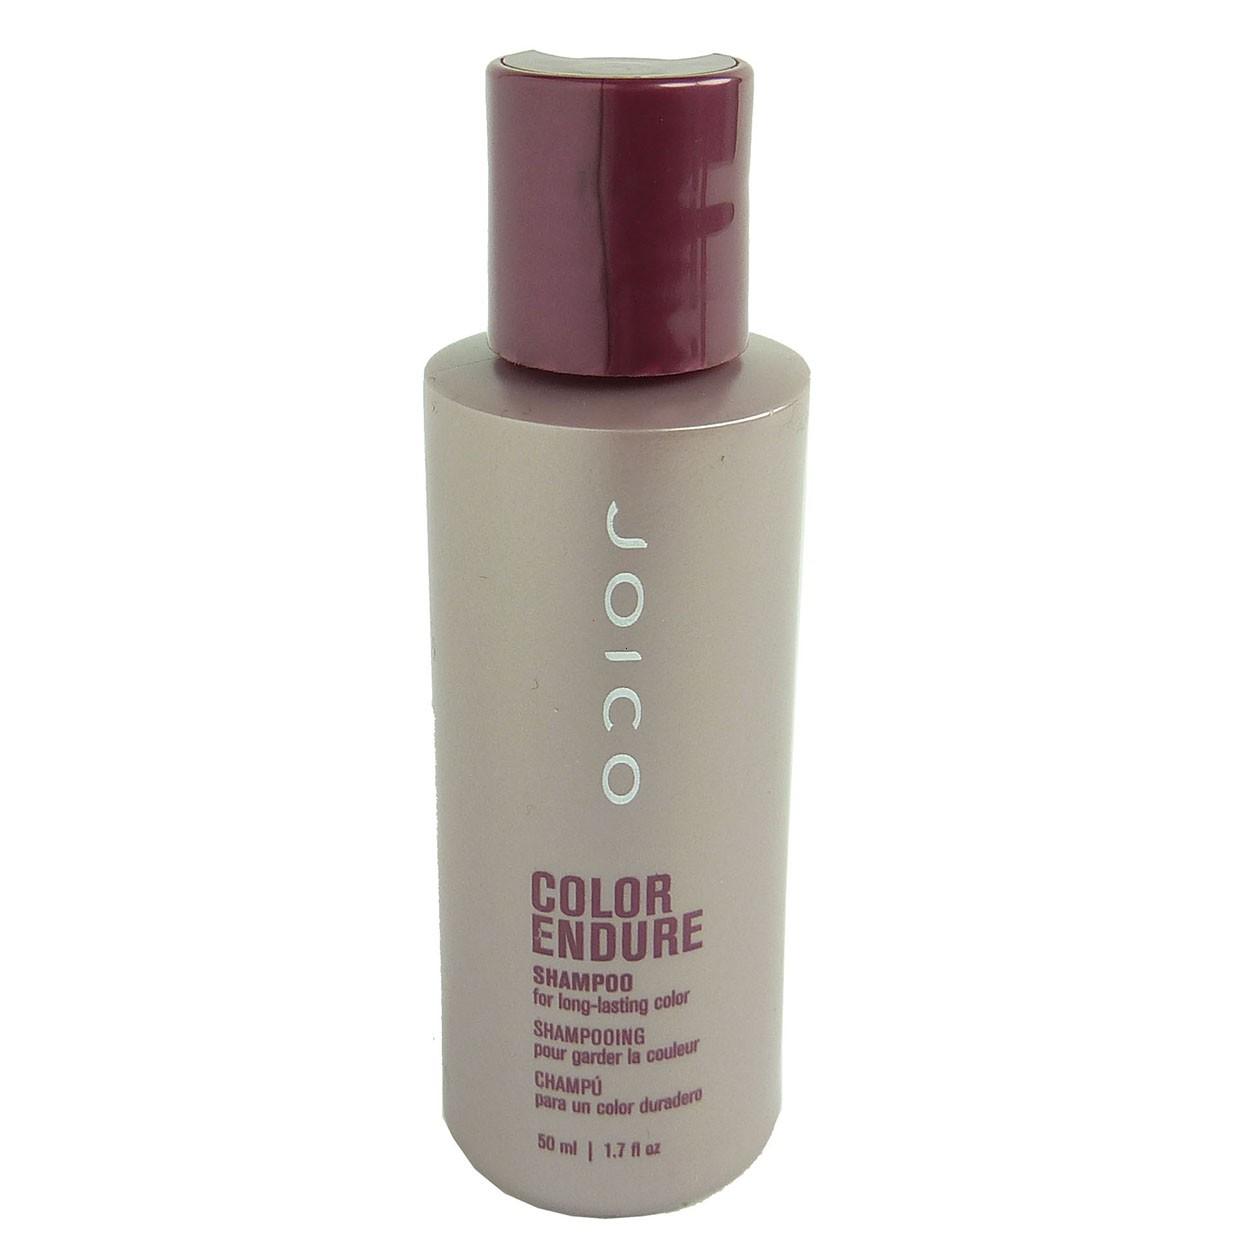 Joico Reise Pflege Set Gefärbtes Haar Shampoo Volume Conditioner